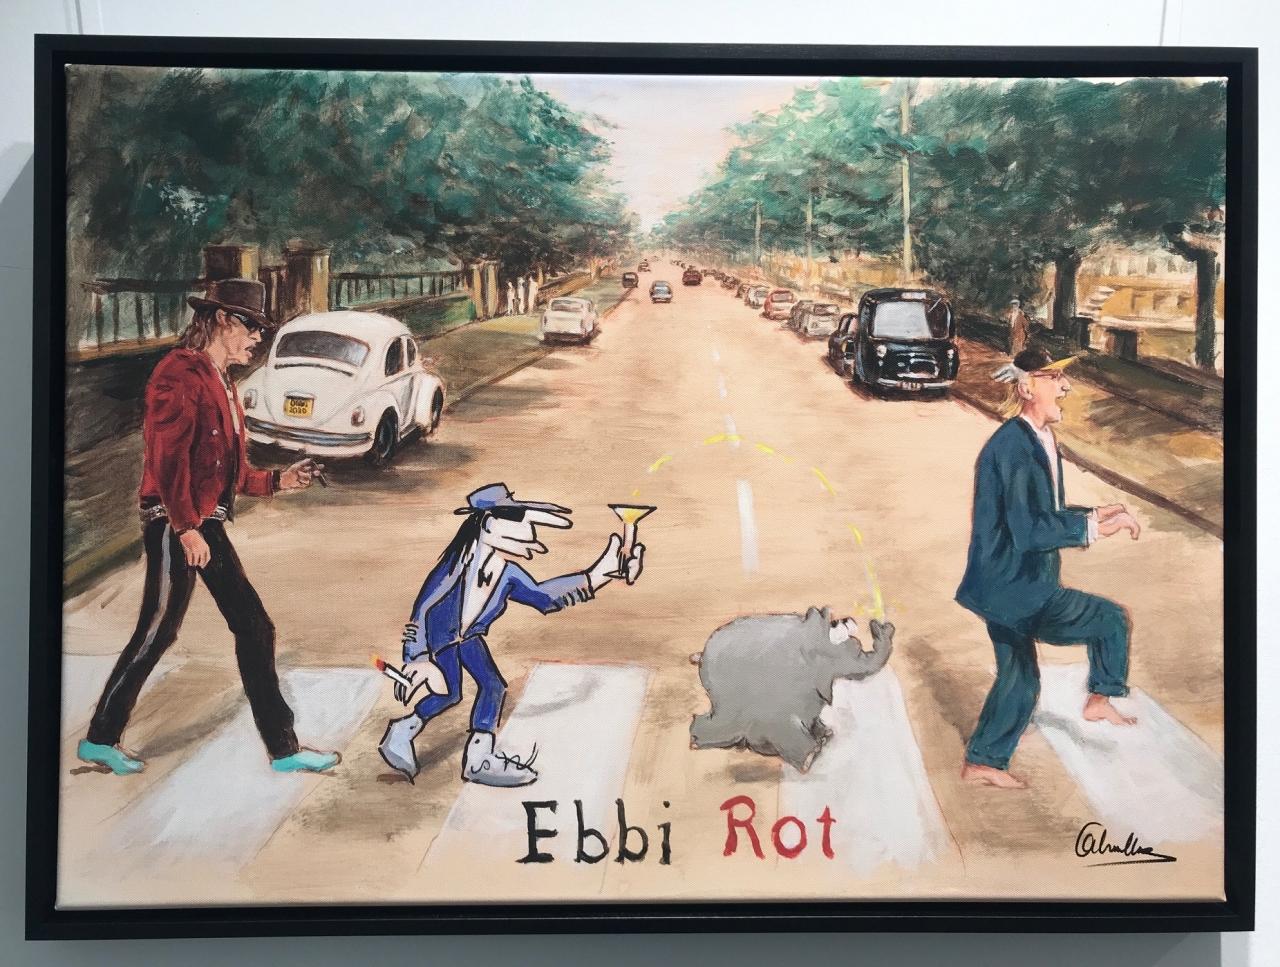 Ebbi Rot - Grafik auf LW (mit Udo Lindenberg) - 2020, gerahmt